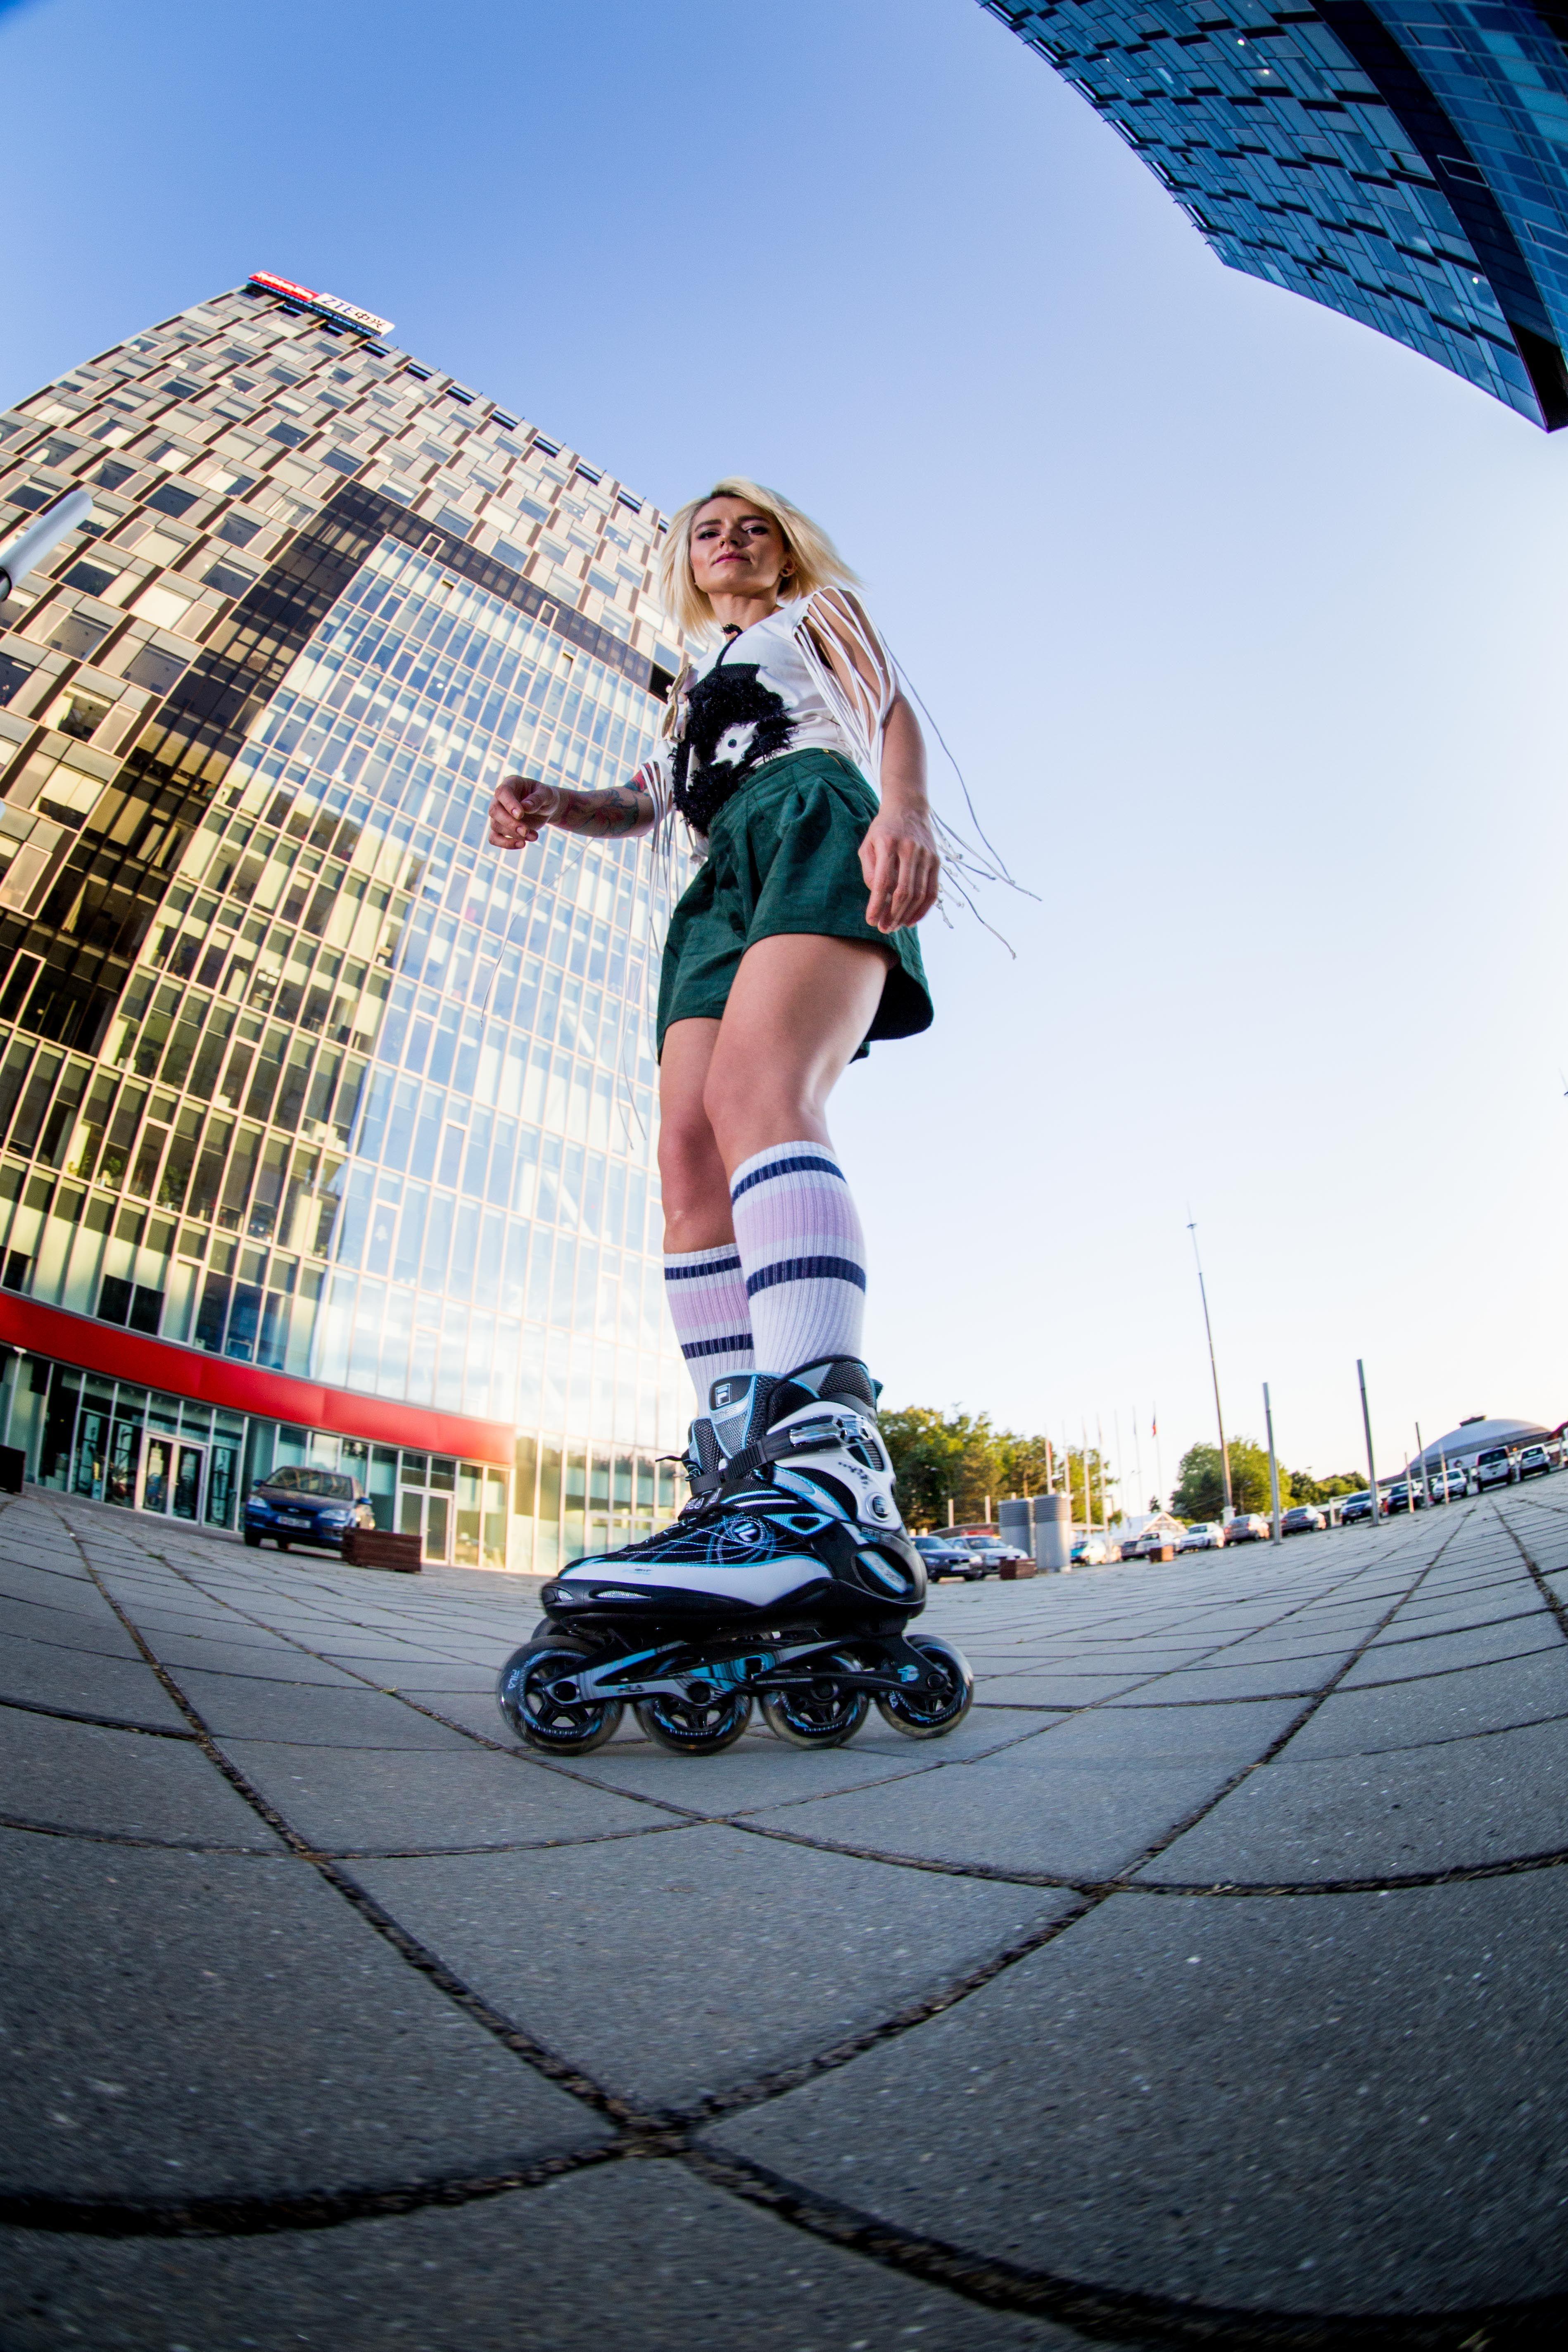 Roller skating rink lafayette in - Skating In Bucharest Skate Girl Rollerblading Inline Skates Fila Skates Fila